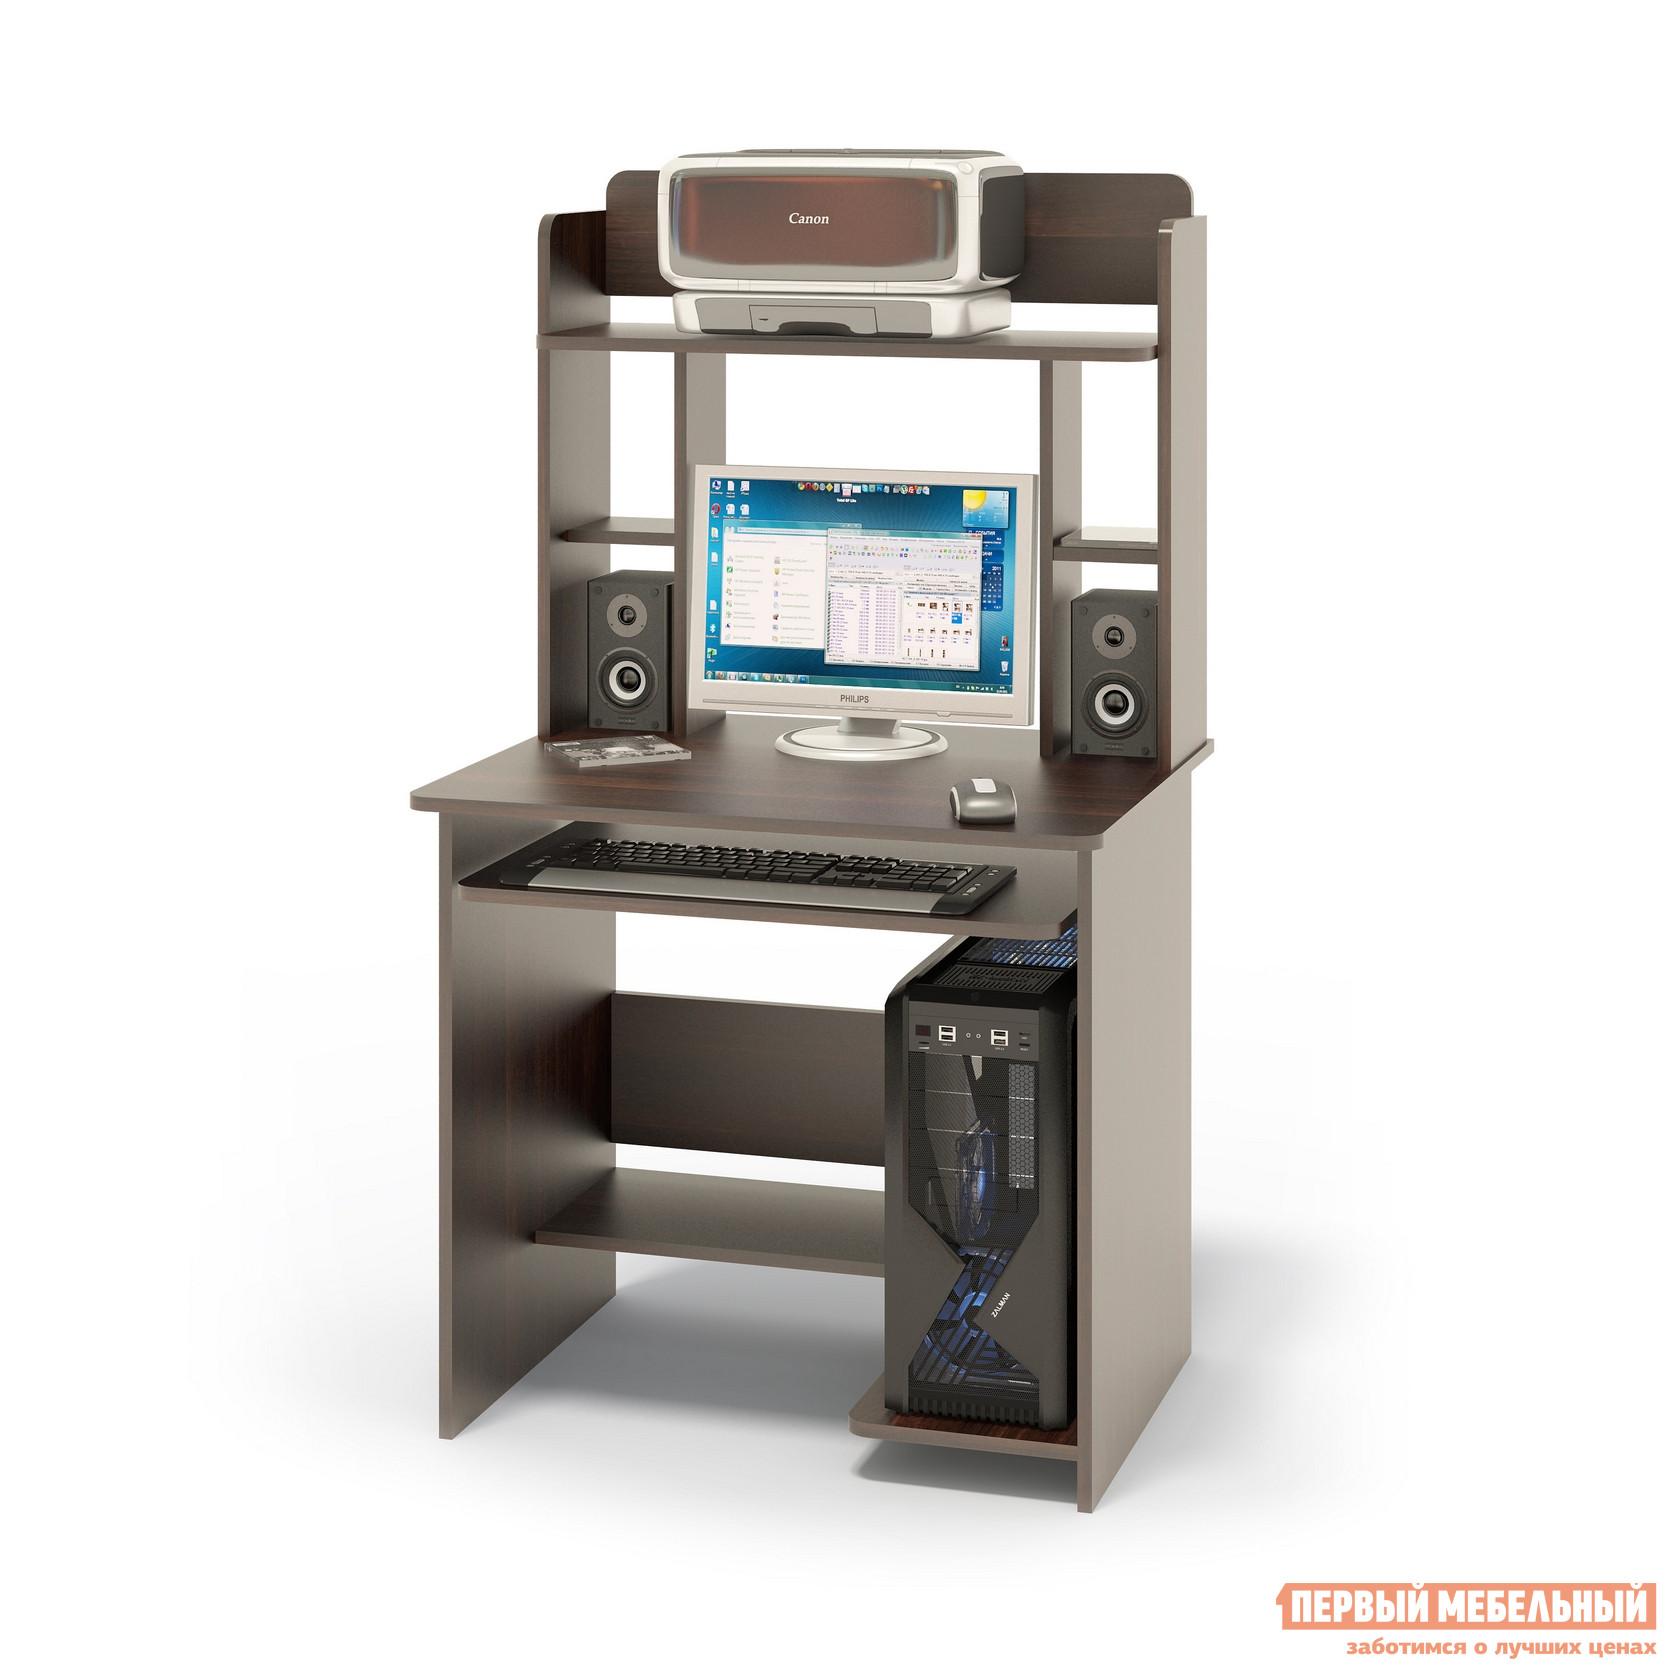 Компьютерный стол Сокол КСТ-01.1+КН-12 Венге